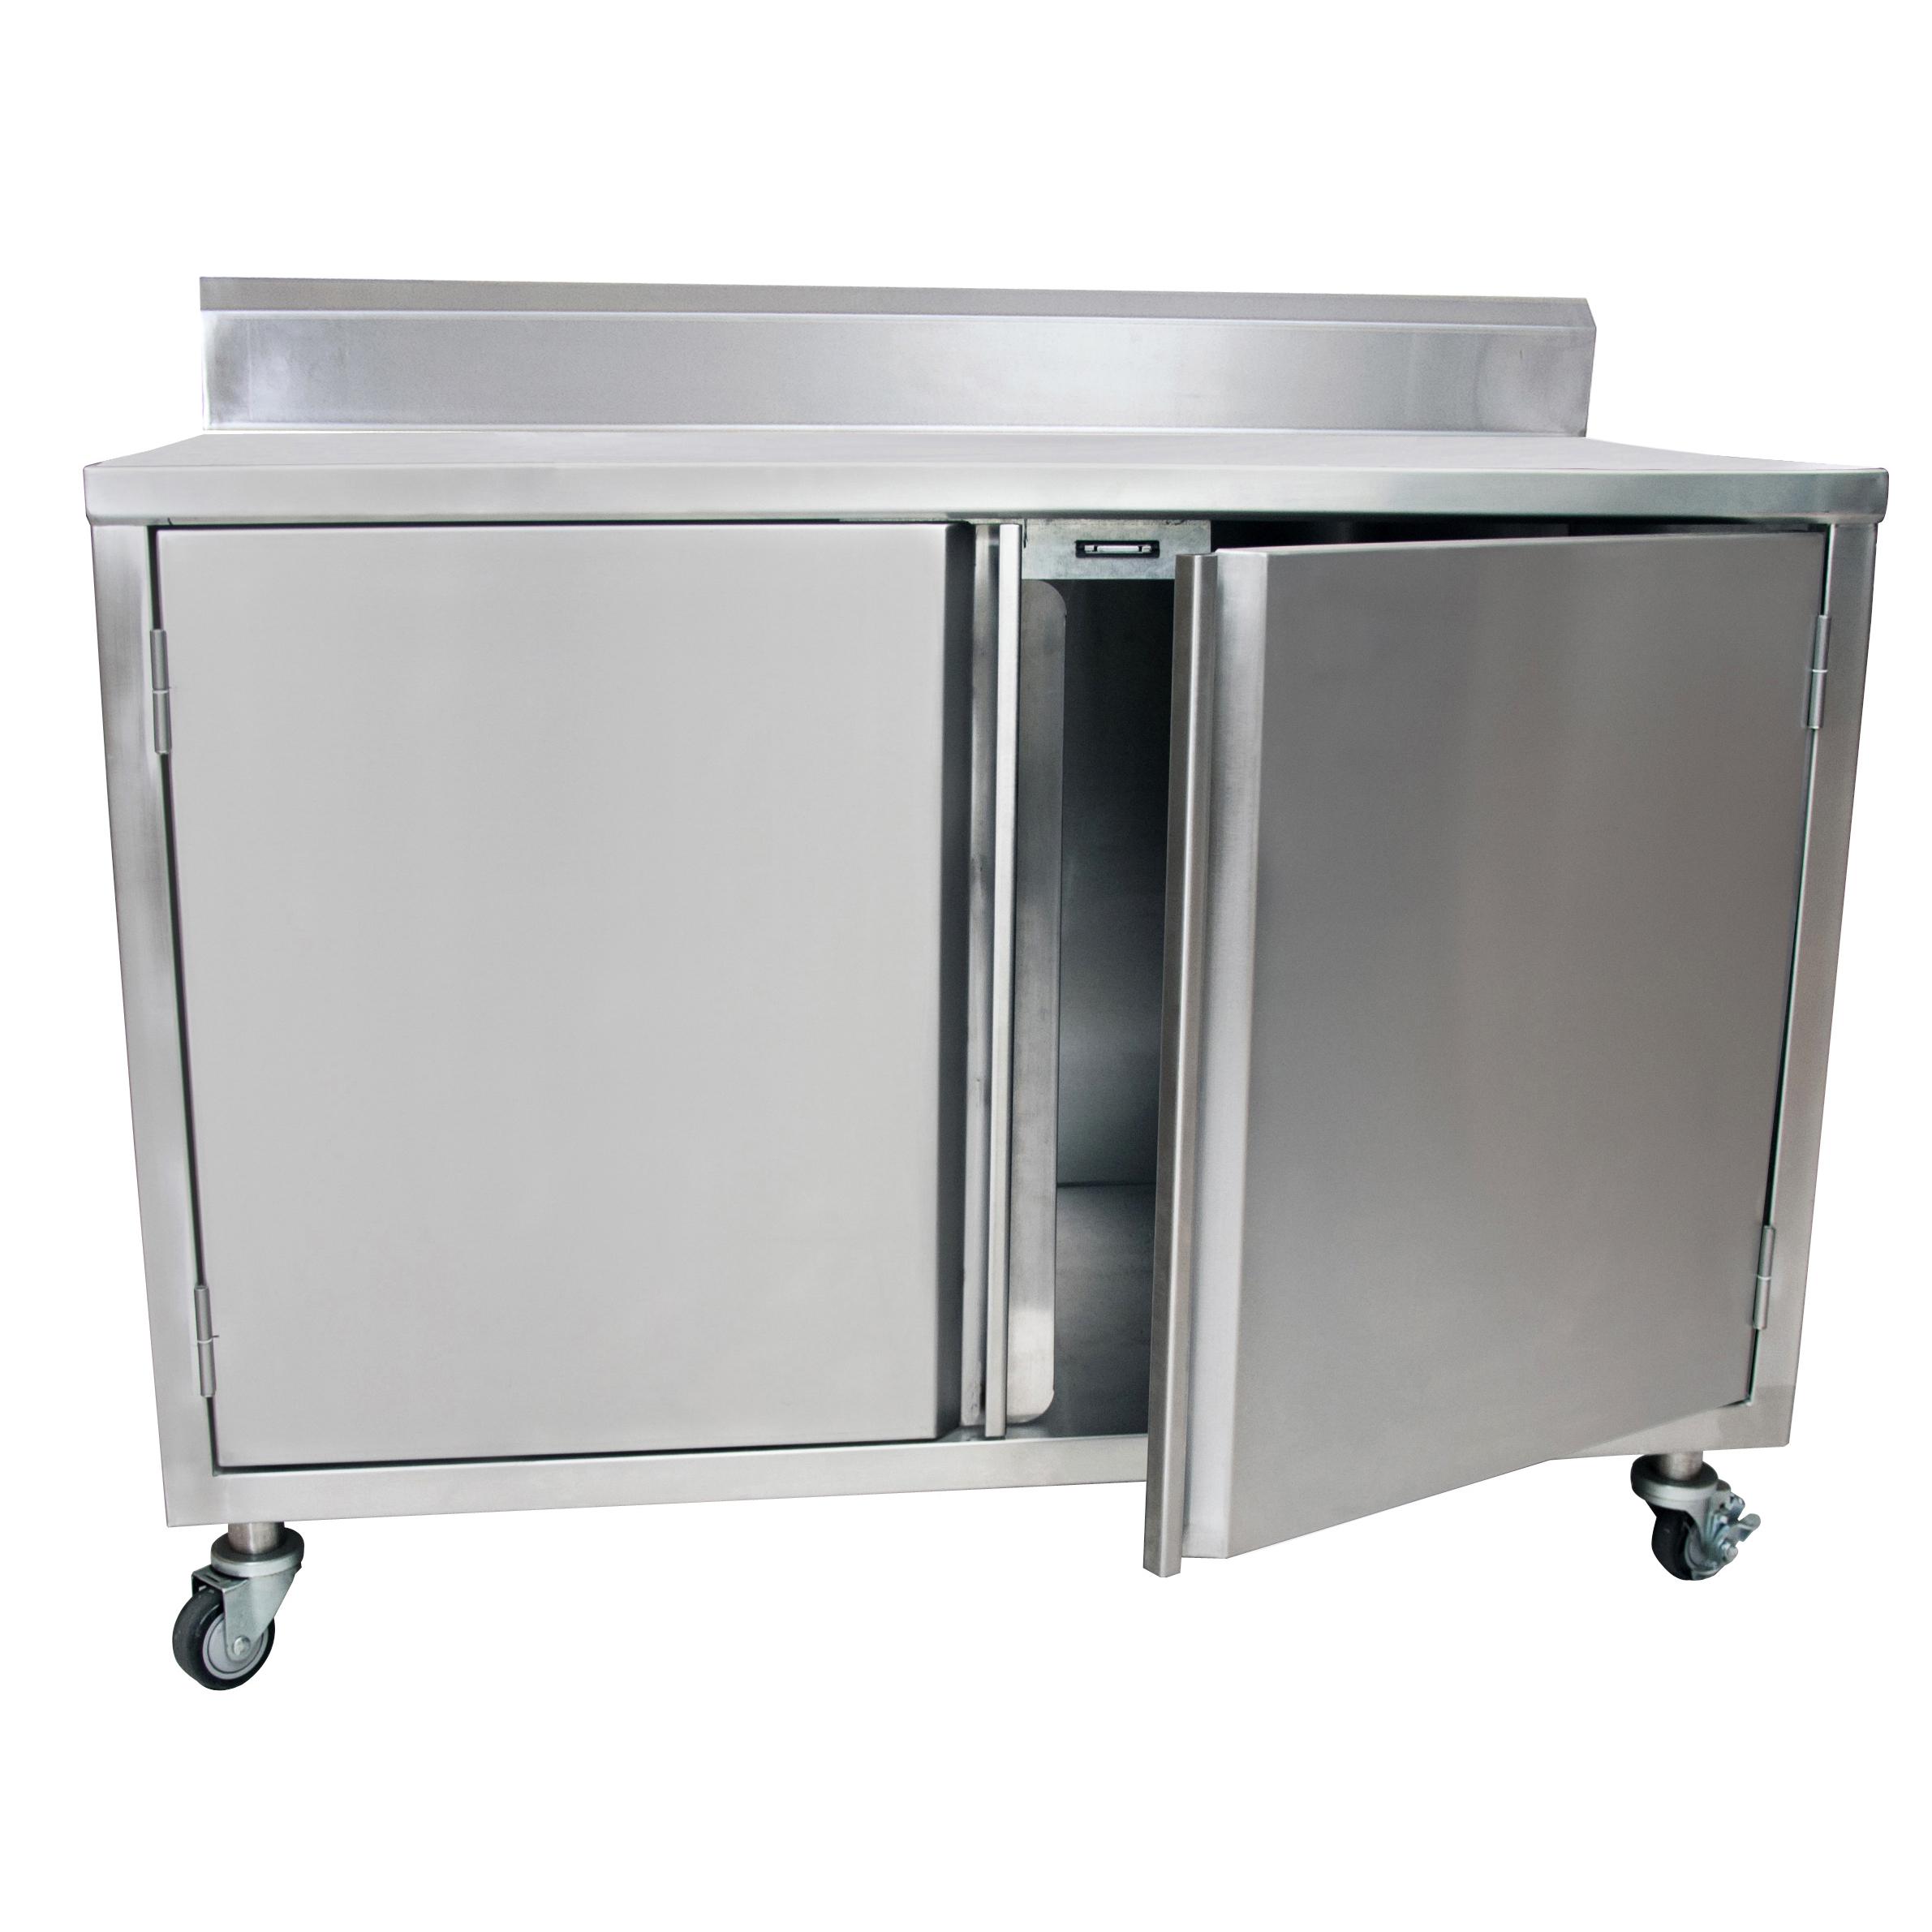 BK Resources BKDCR5-2418H work table, cabinet base hinged doors